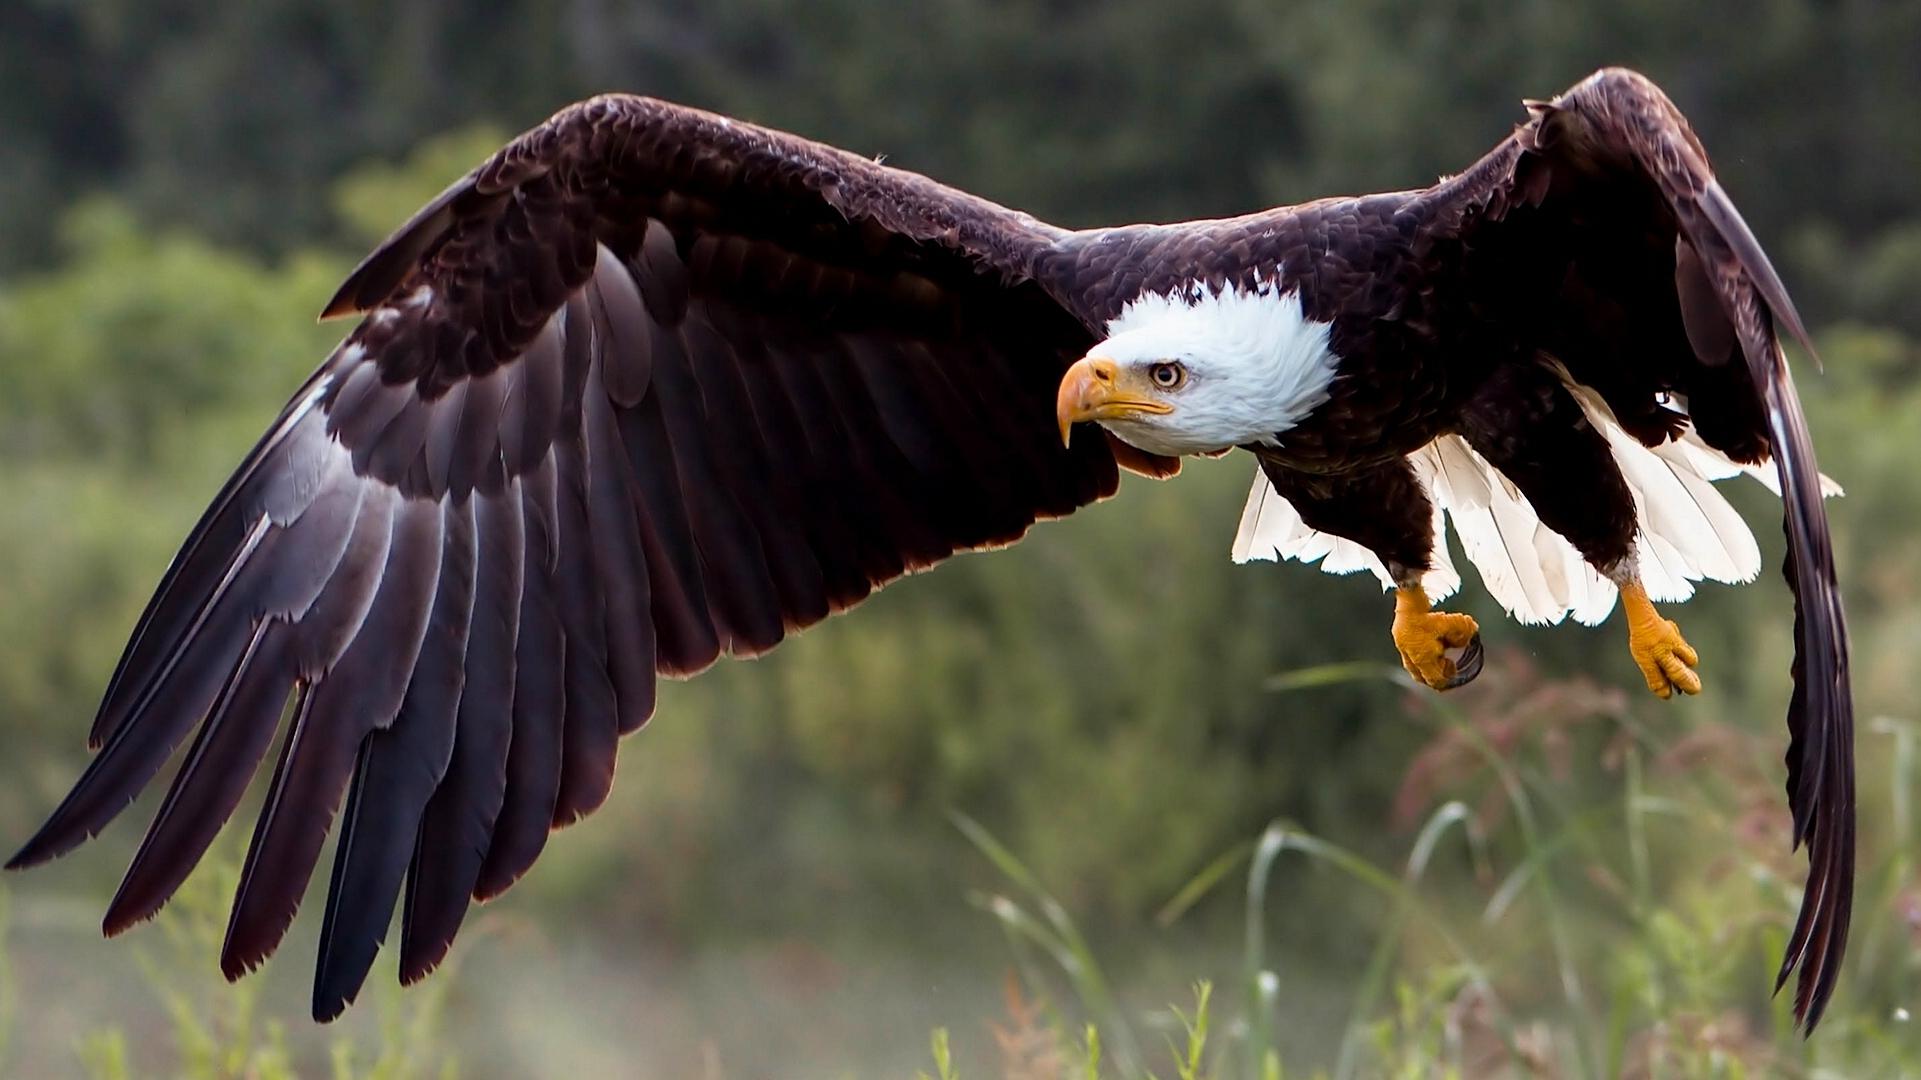 Картинка крылья хищной птицы